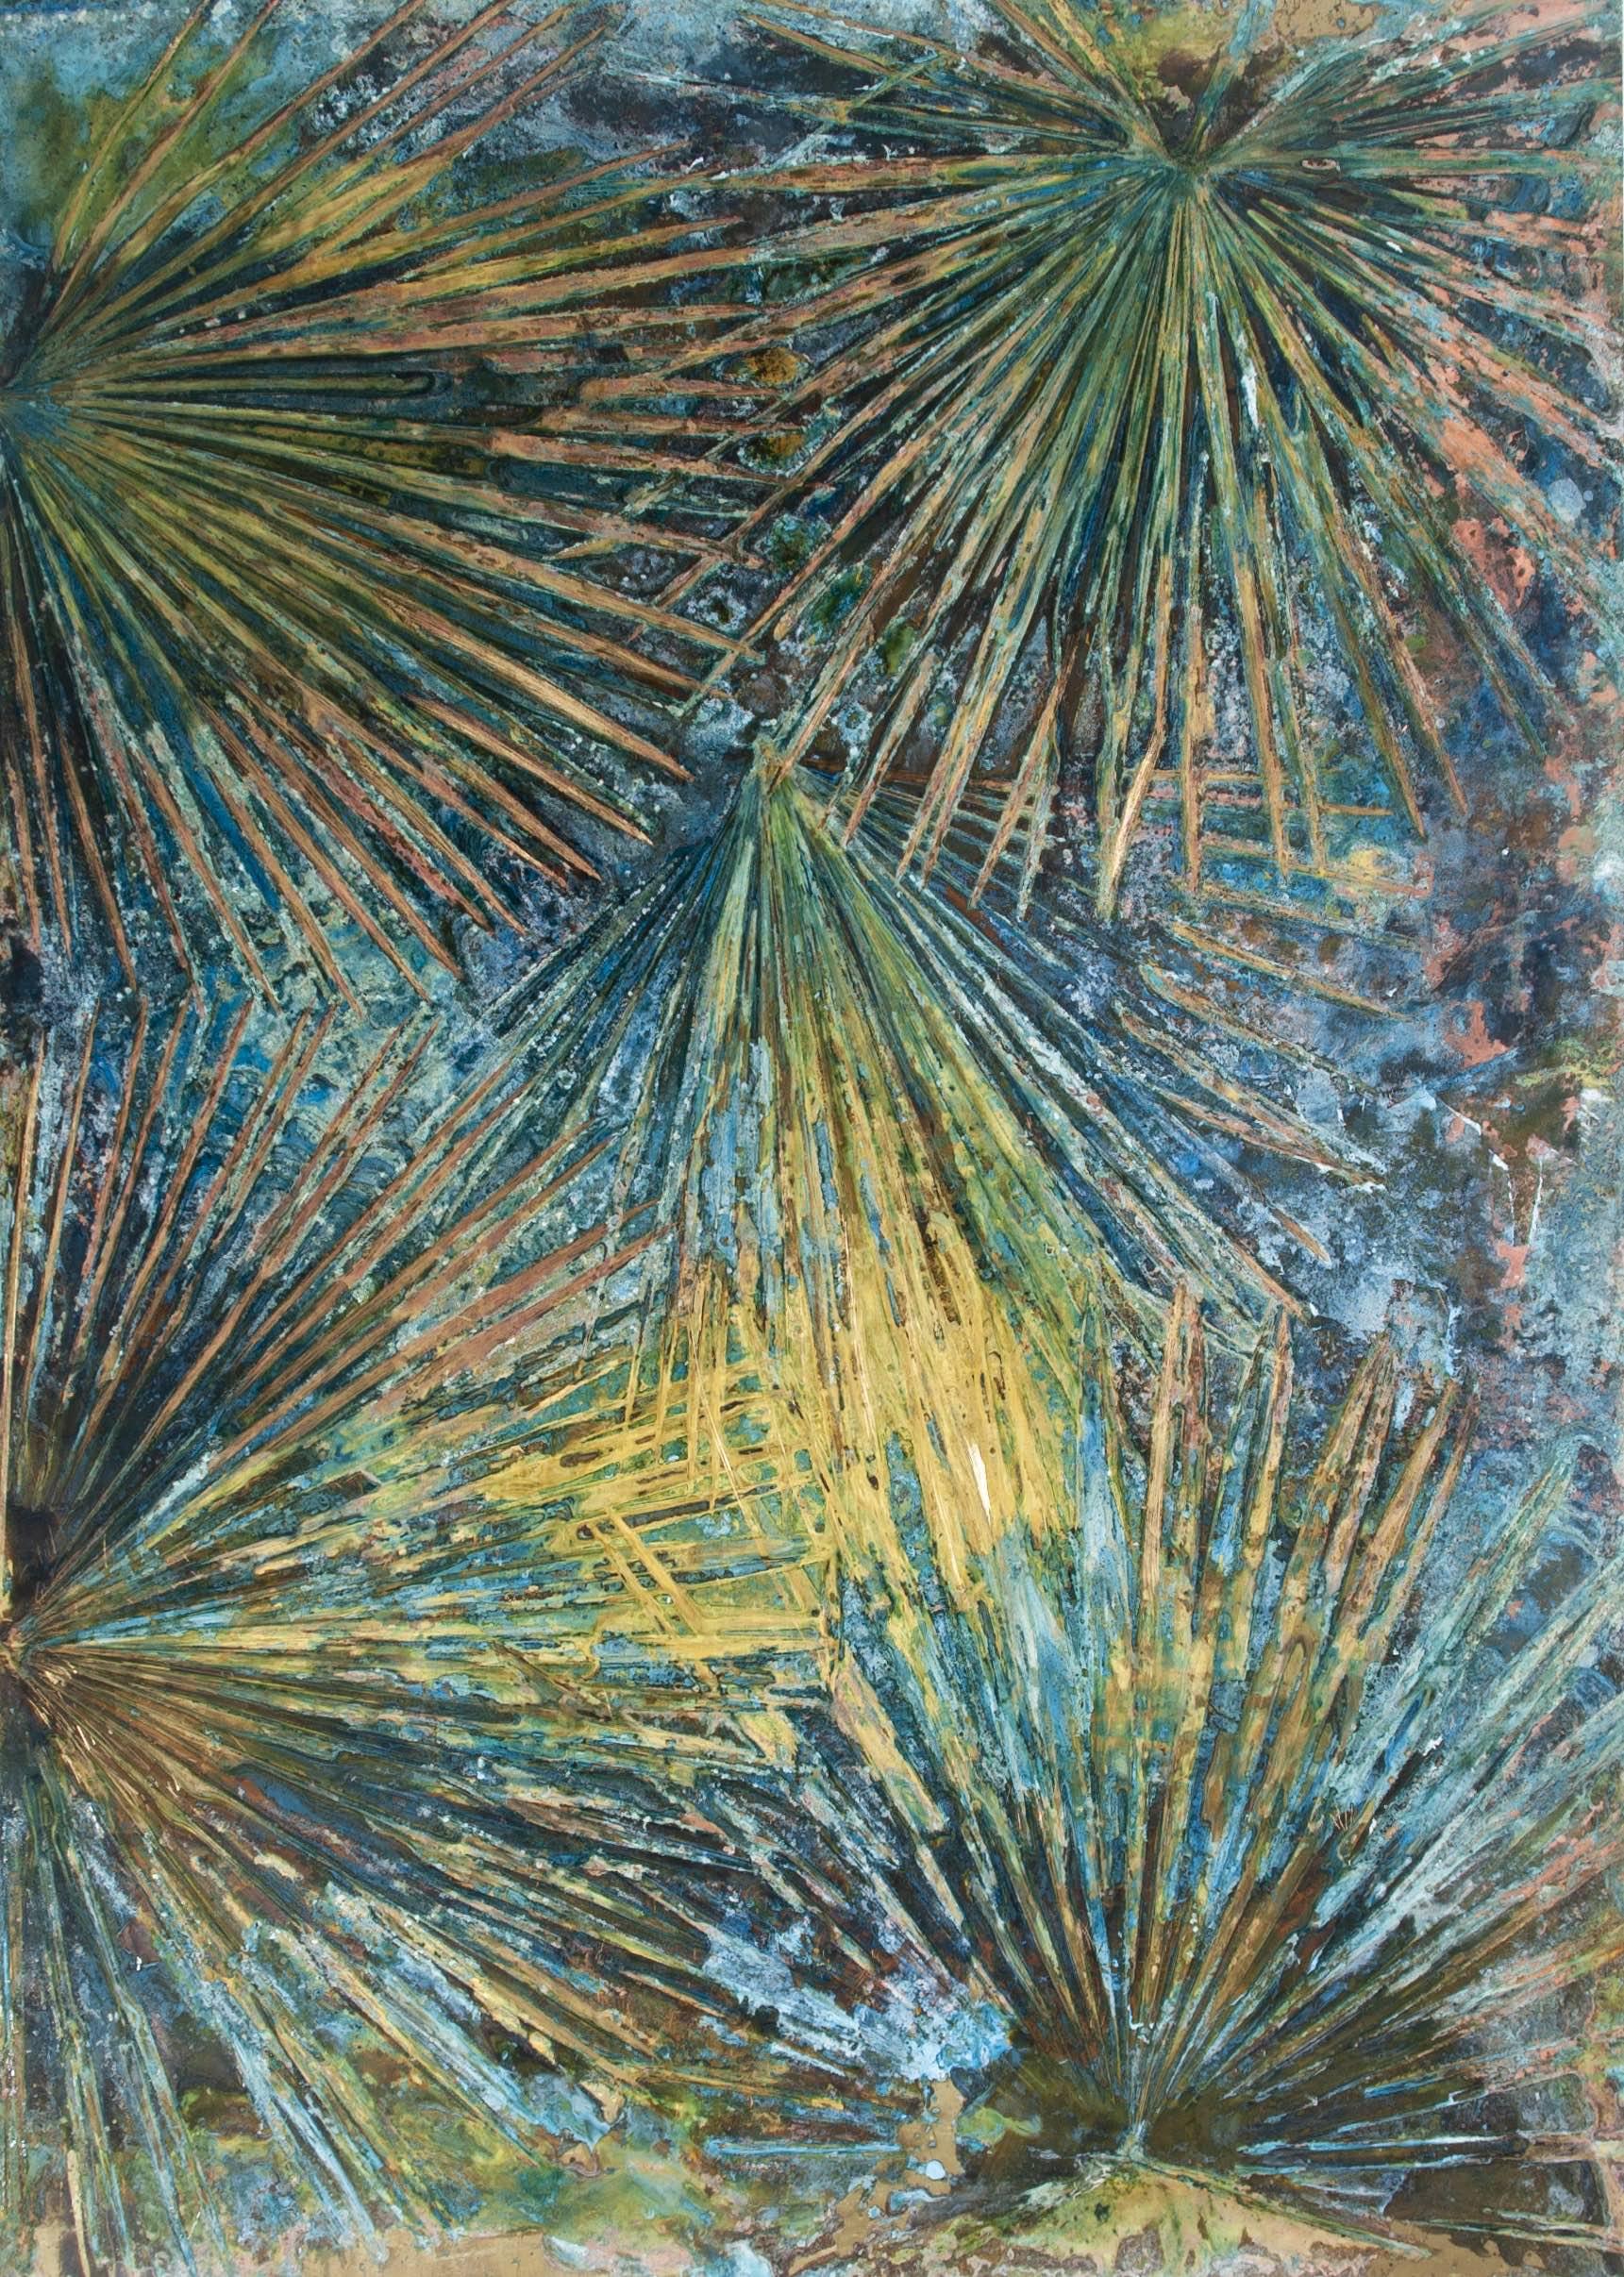 """Chamaerops humilis 2"" ottone ossidato, 100 cm x 140 cm"